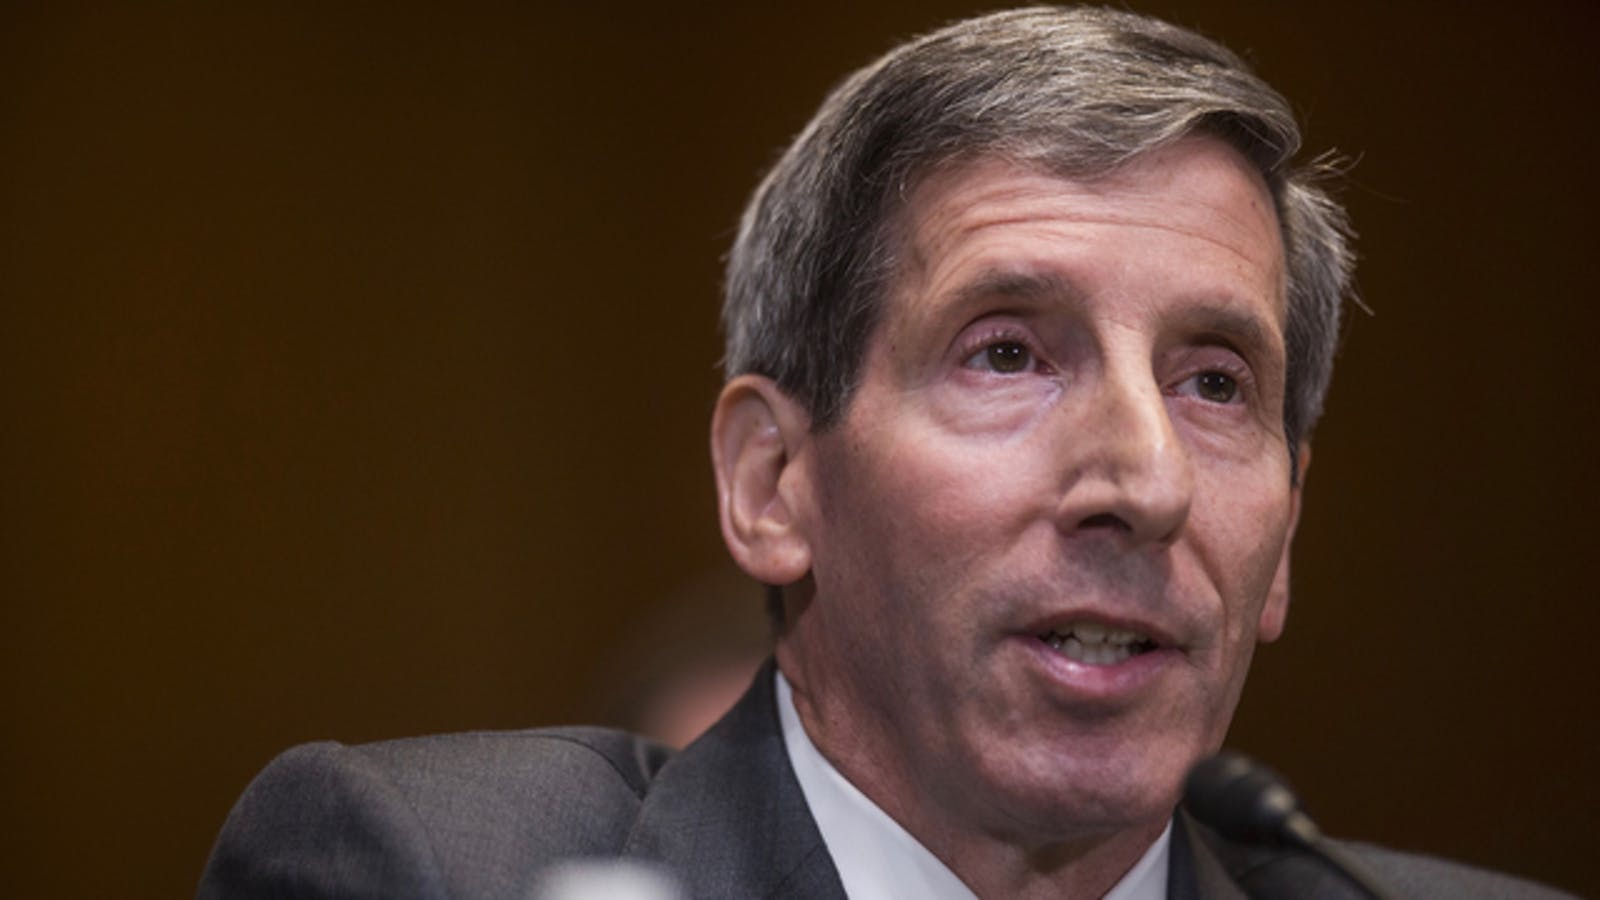 FTC Chairman Joe Simons spoke during a Senate  hearing in May 2018. Photo: Bloomberg